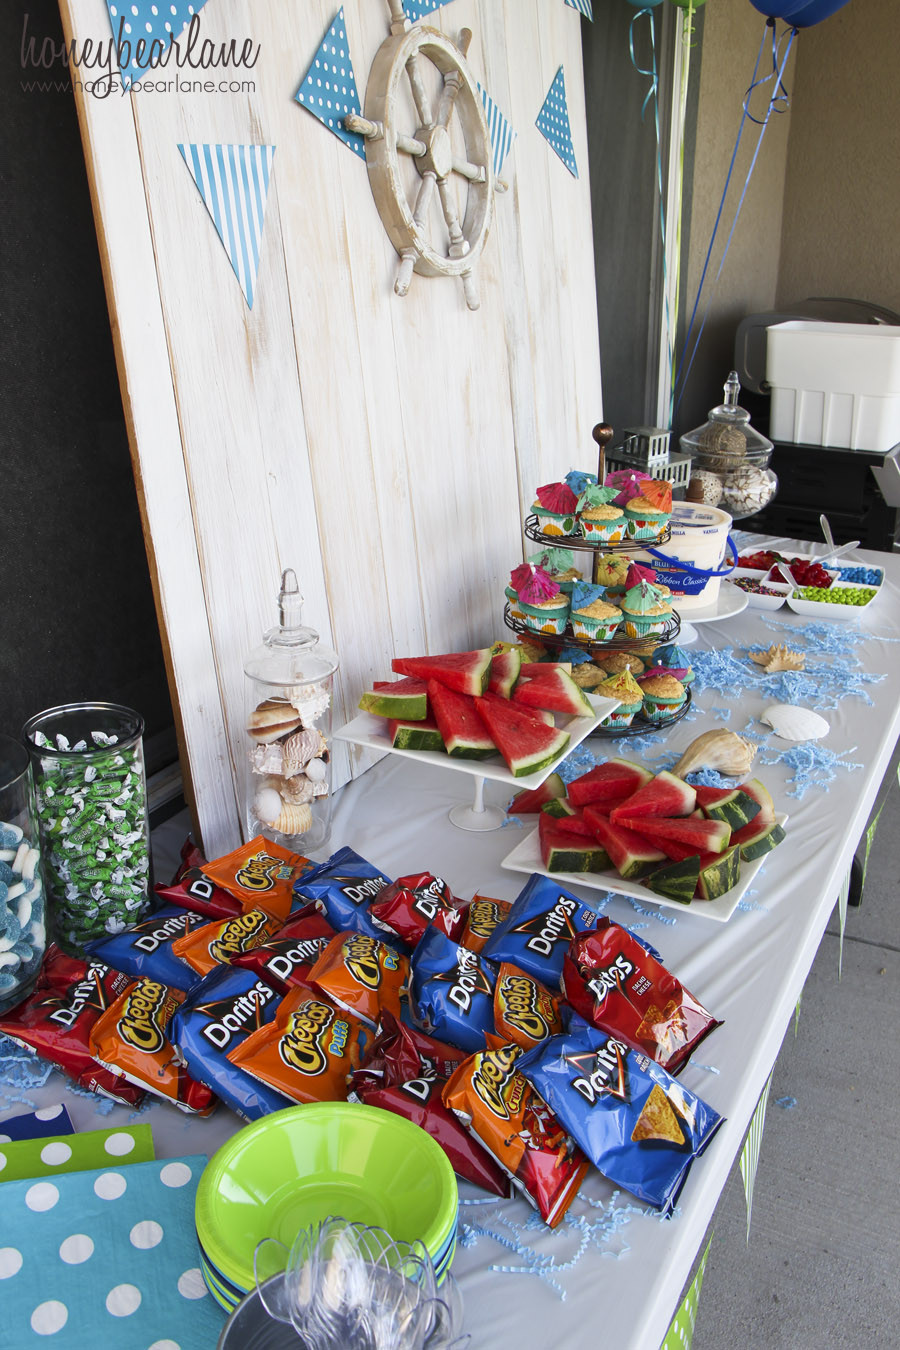 Summer Water Party Ideas  Water Themed Birthday Party Honeybear Lane